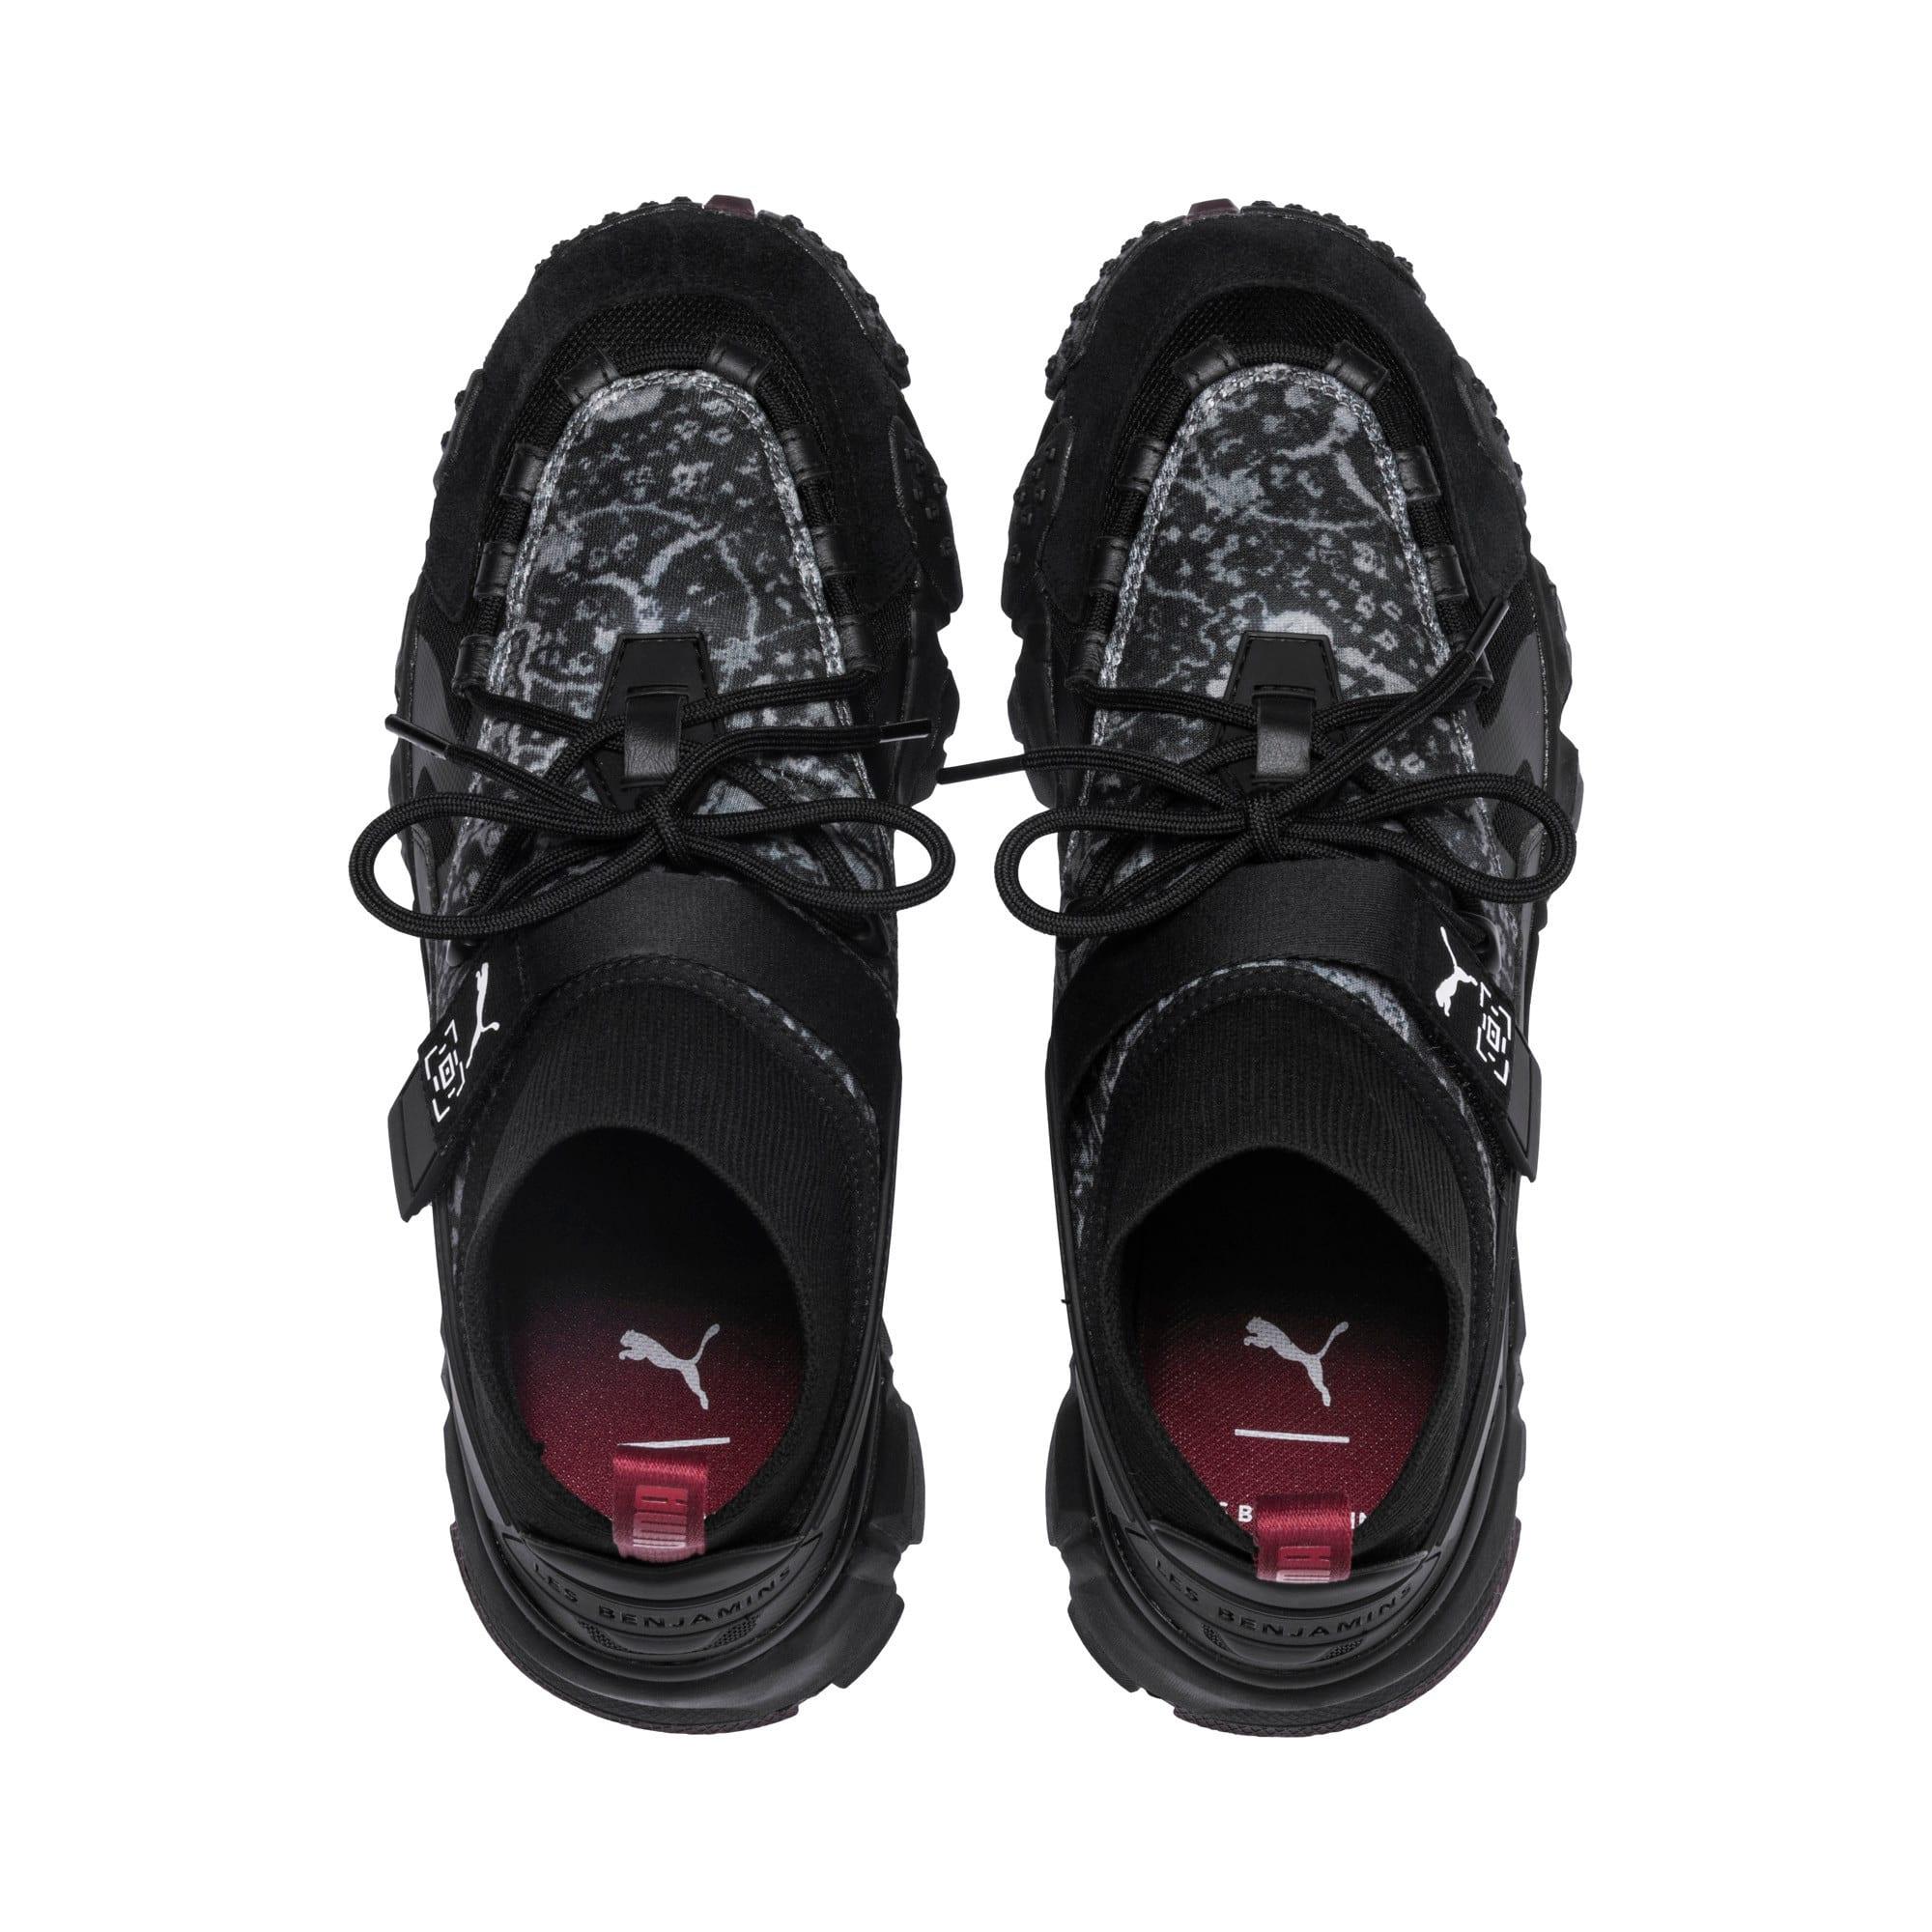 Thumbnail 7 van PUMA x LES BENJAMINS Trailfox schoenen, Puma Black, medium